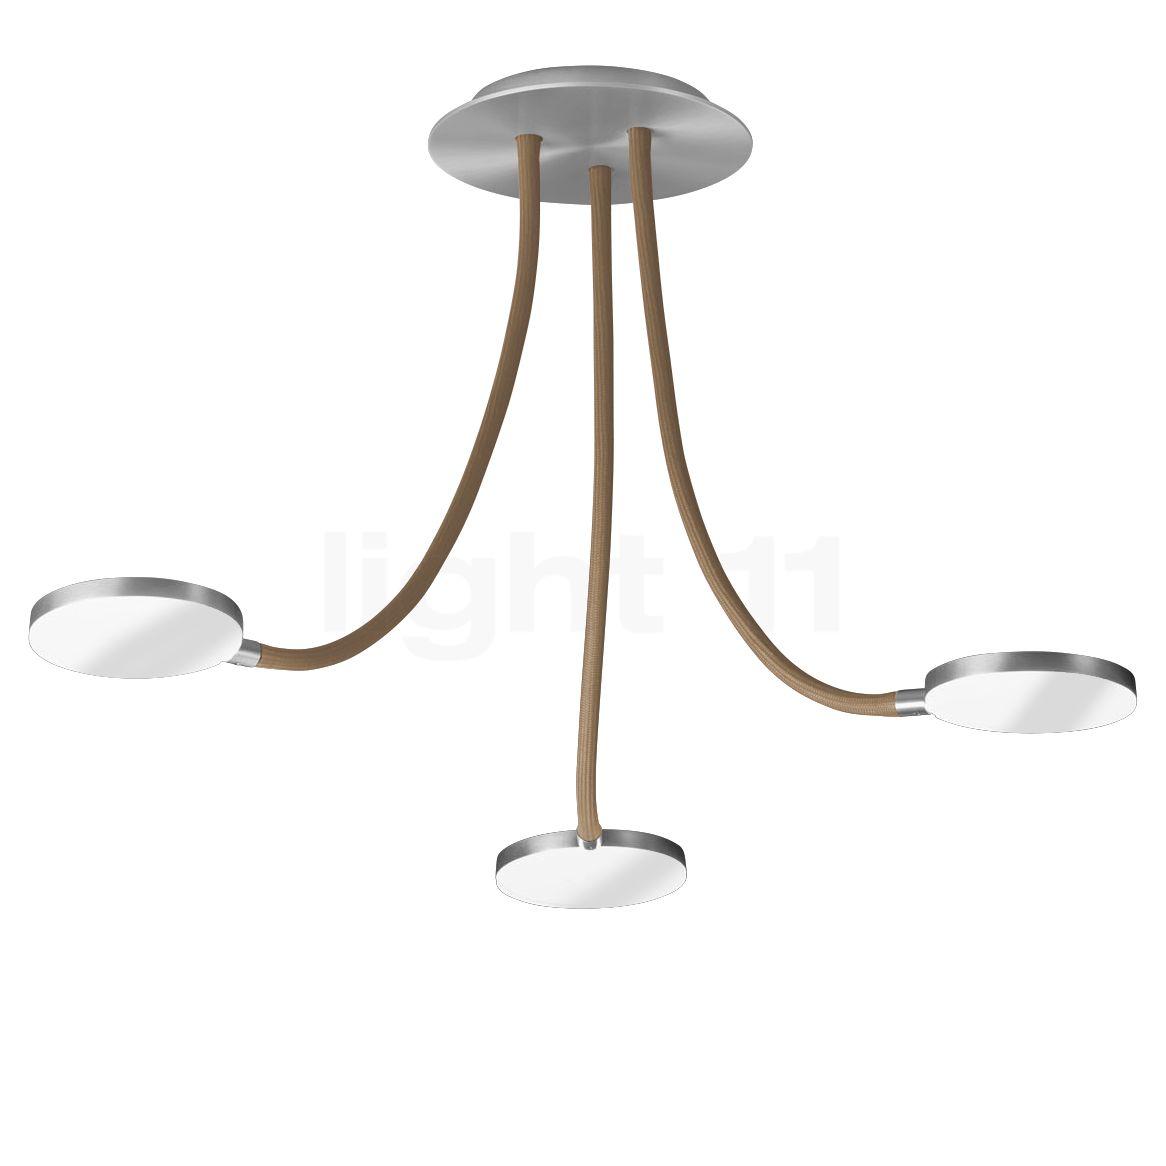 Holtktter flex d3 ceiling light led ceiling lights arubaitofo Image collections